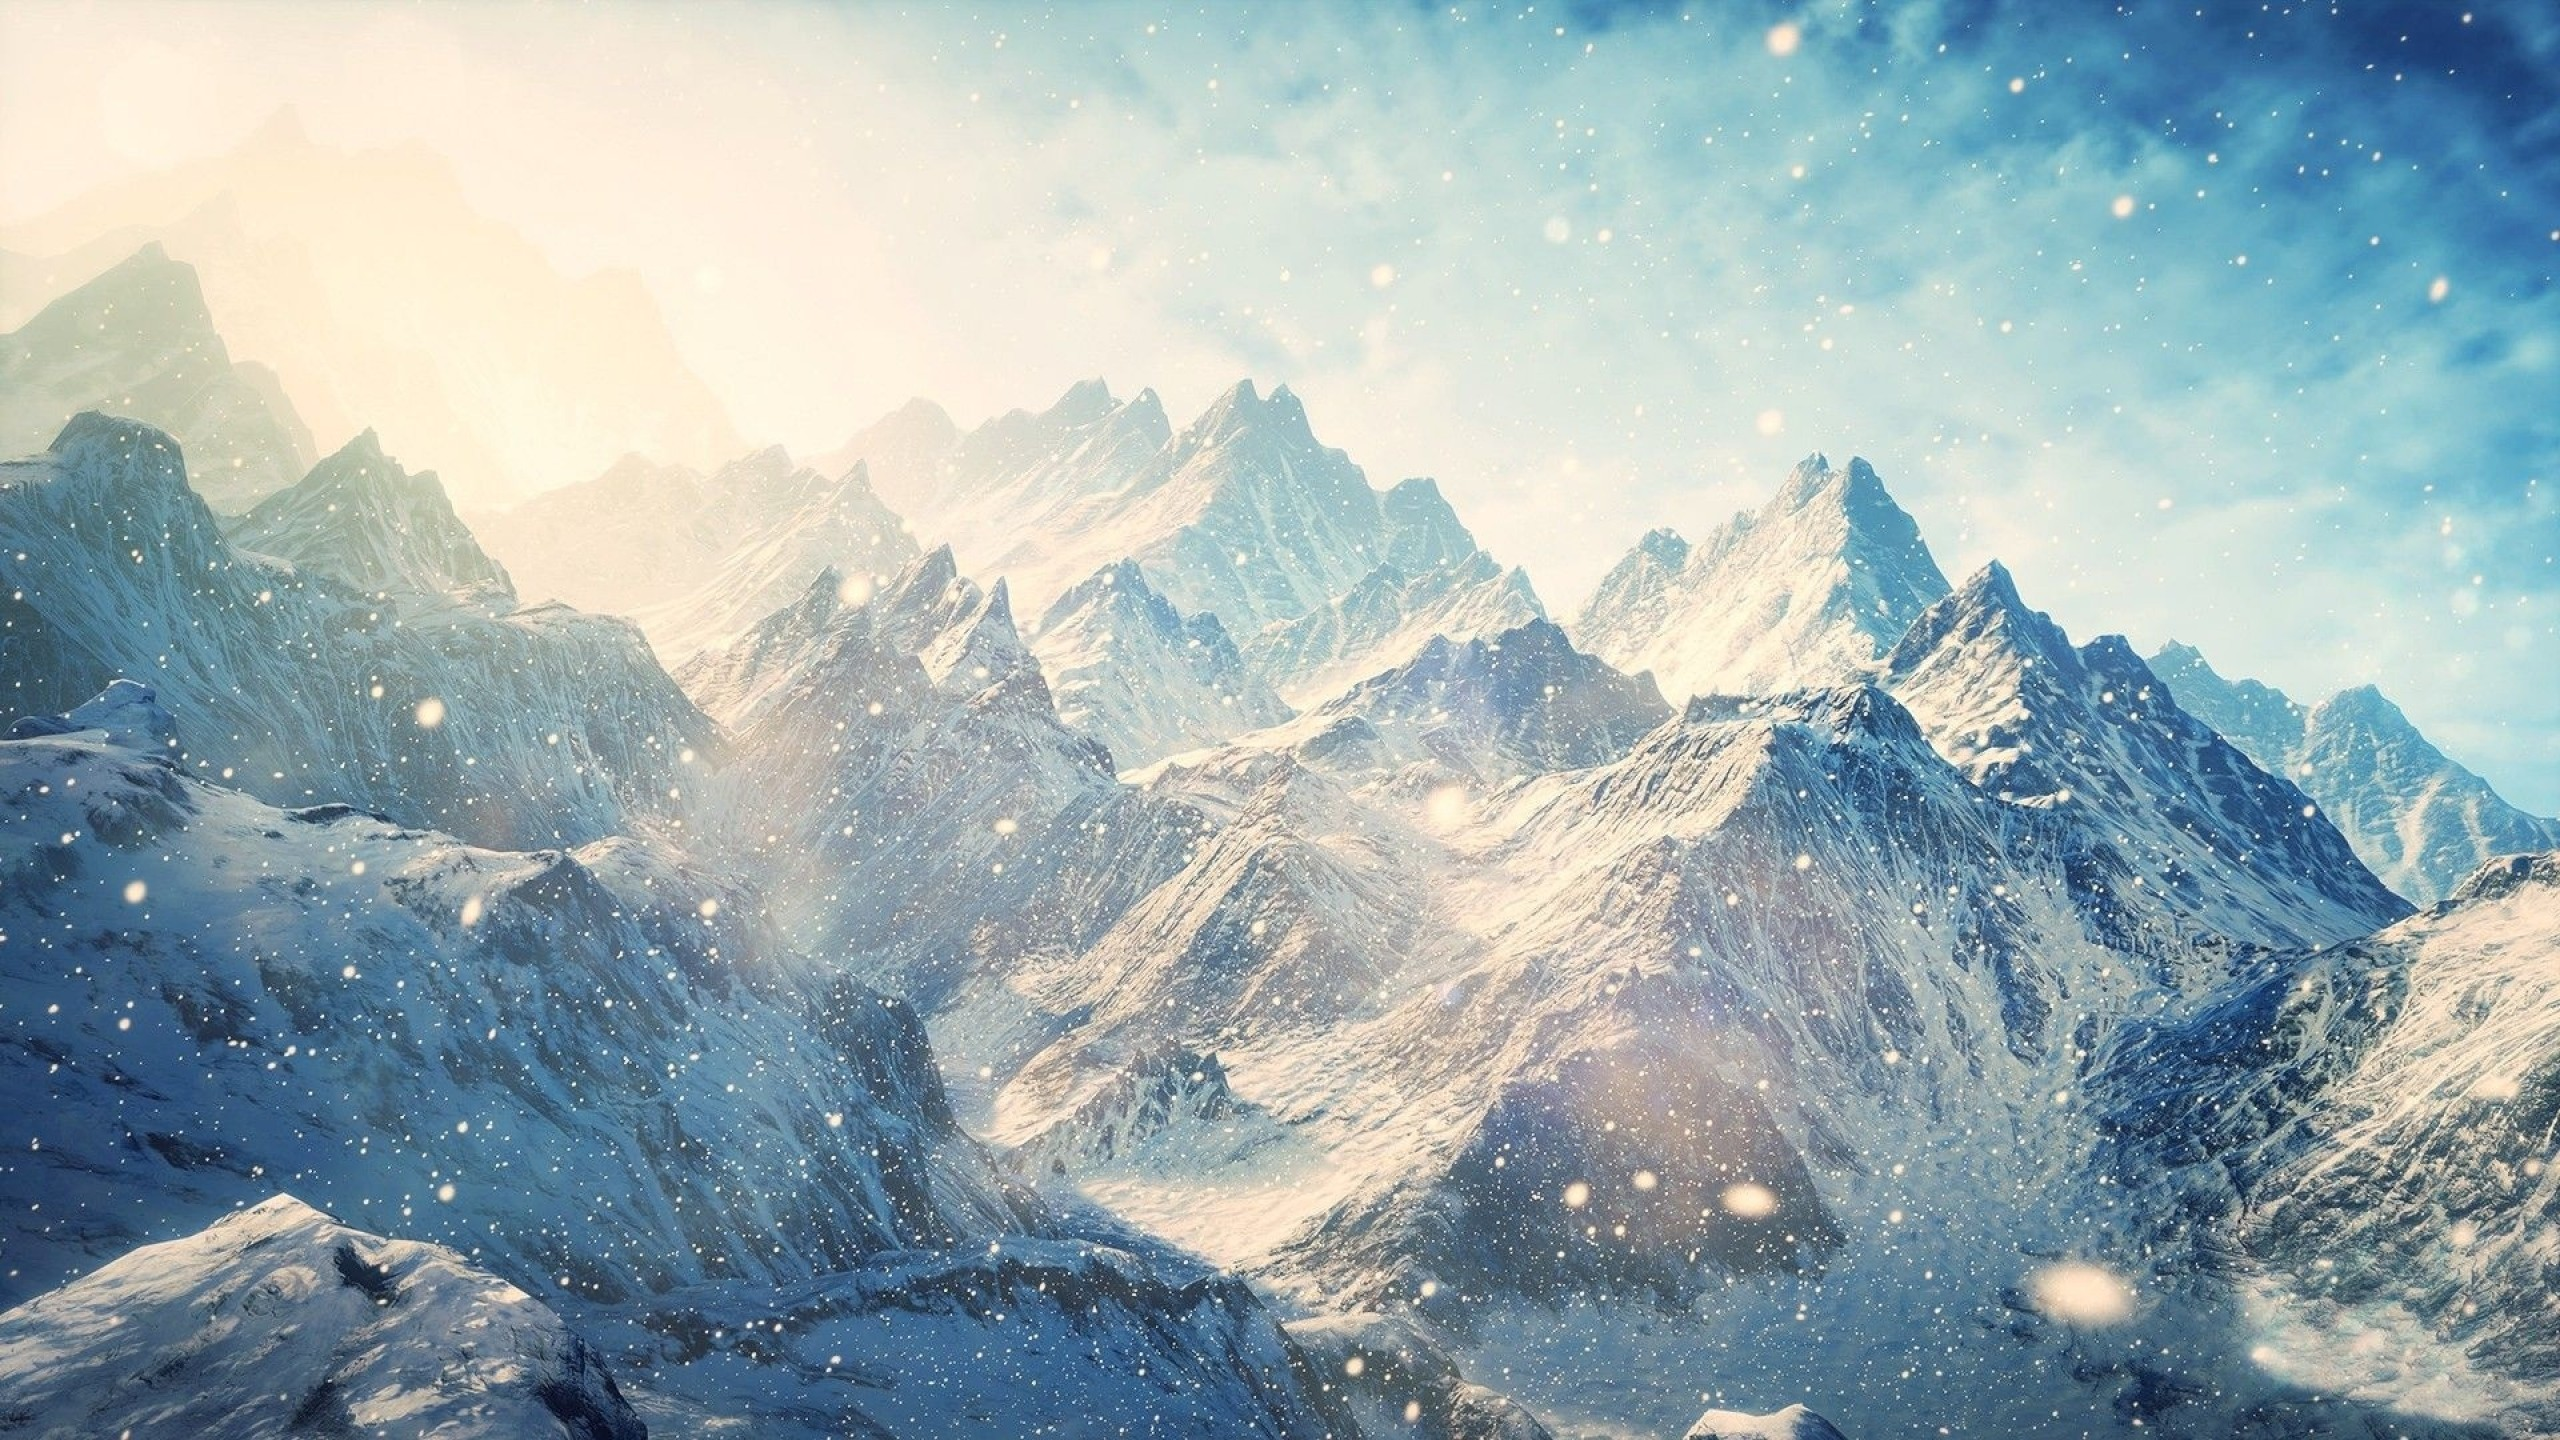 Preview wallpaper skyrim, mountains, winter, snow, shine, glare 2560×1440